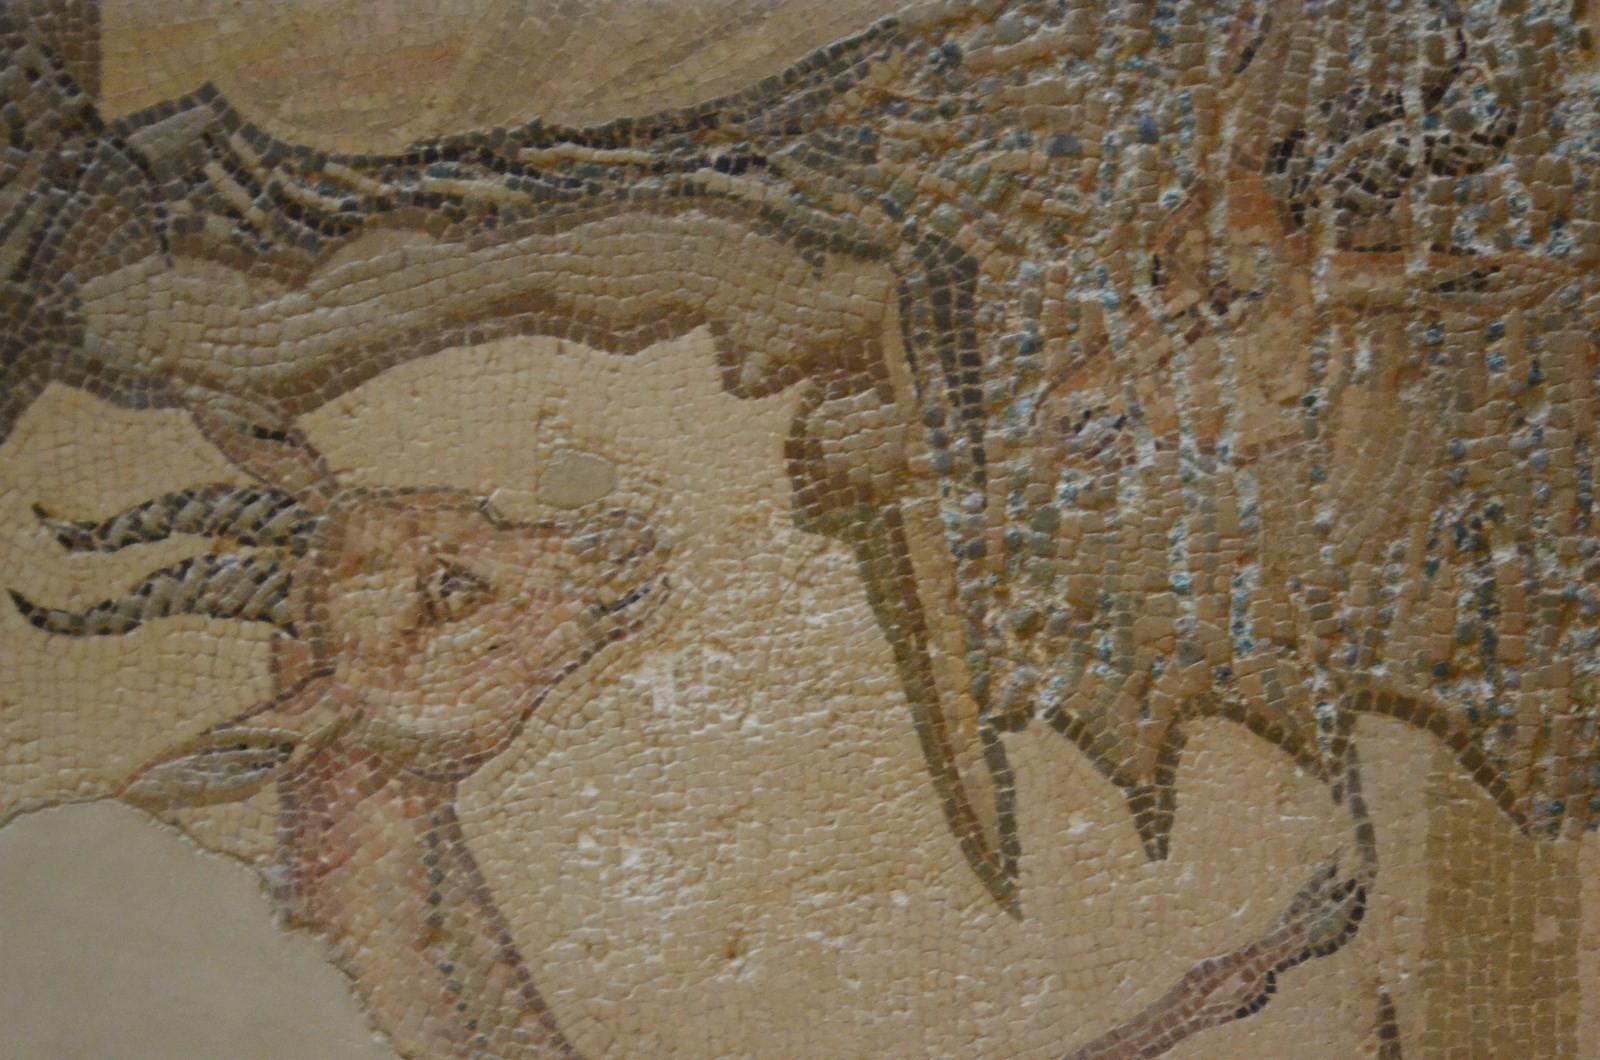 Agrigento, Archäologisches Museum, Mosaik (Detail)